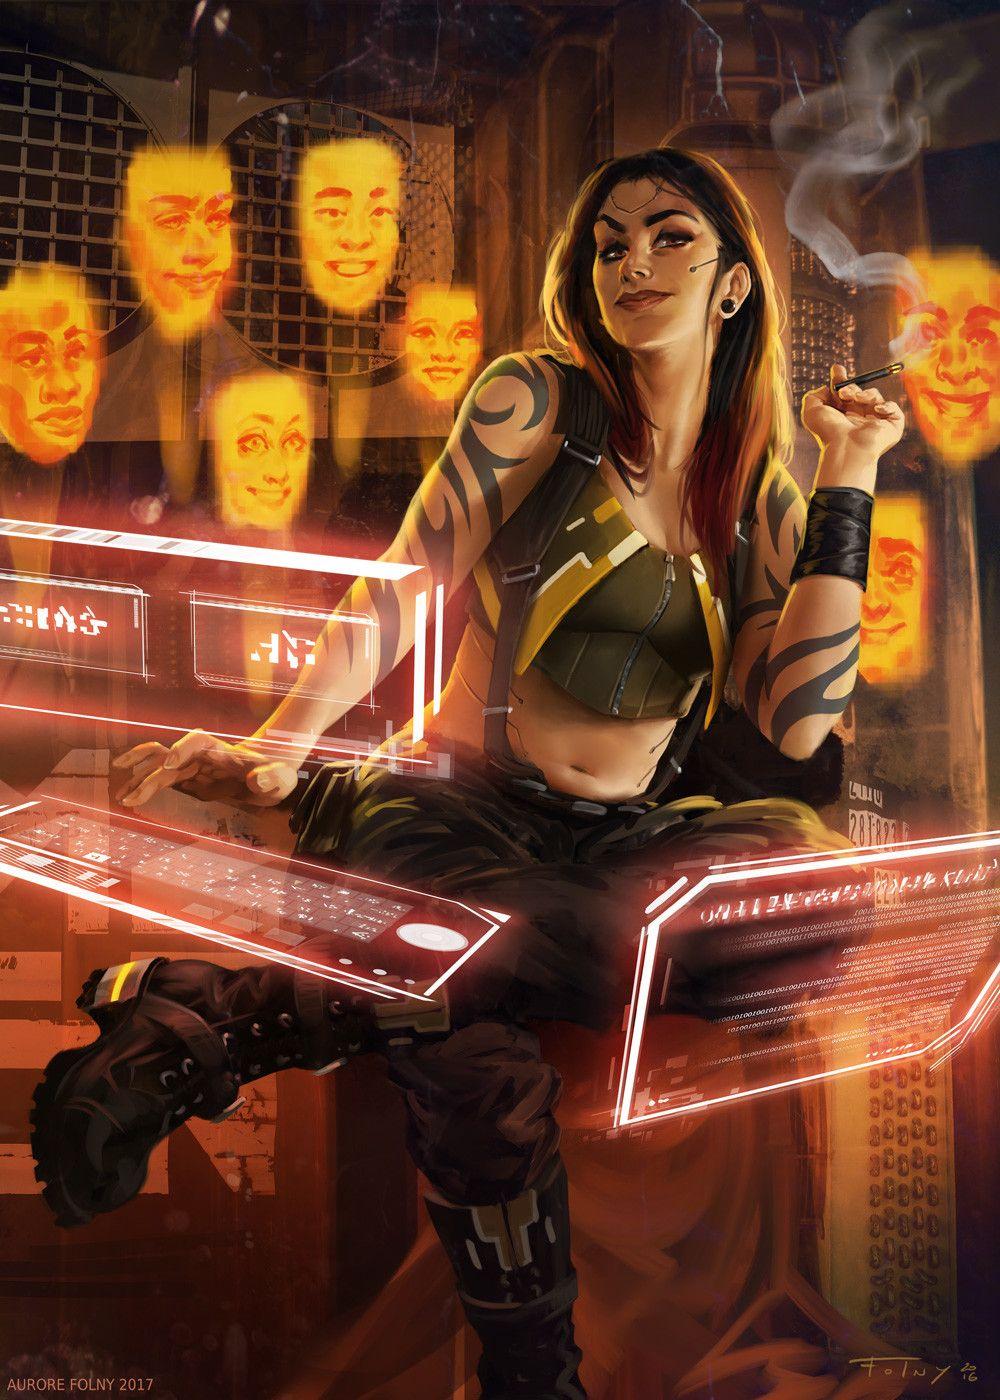 Pin by Tuomas Kuusniemi on SF Civilians Cyberpunk girl